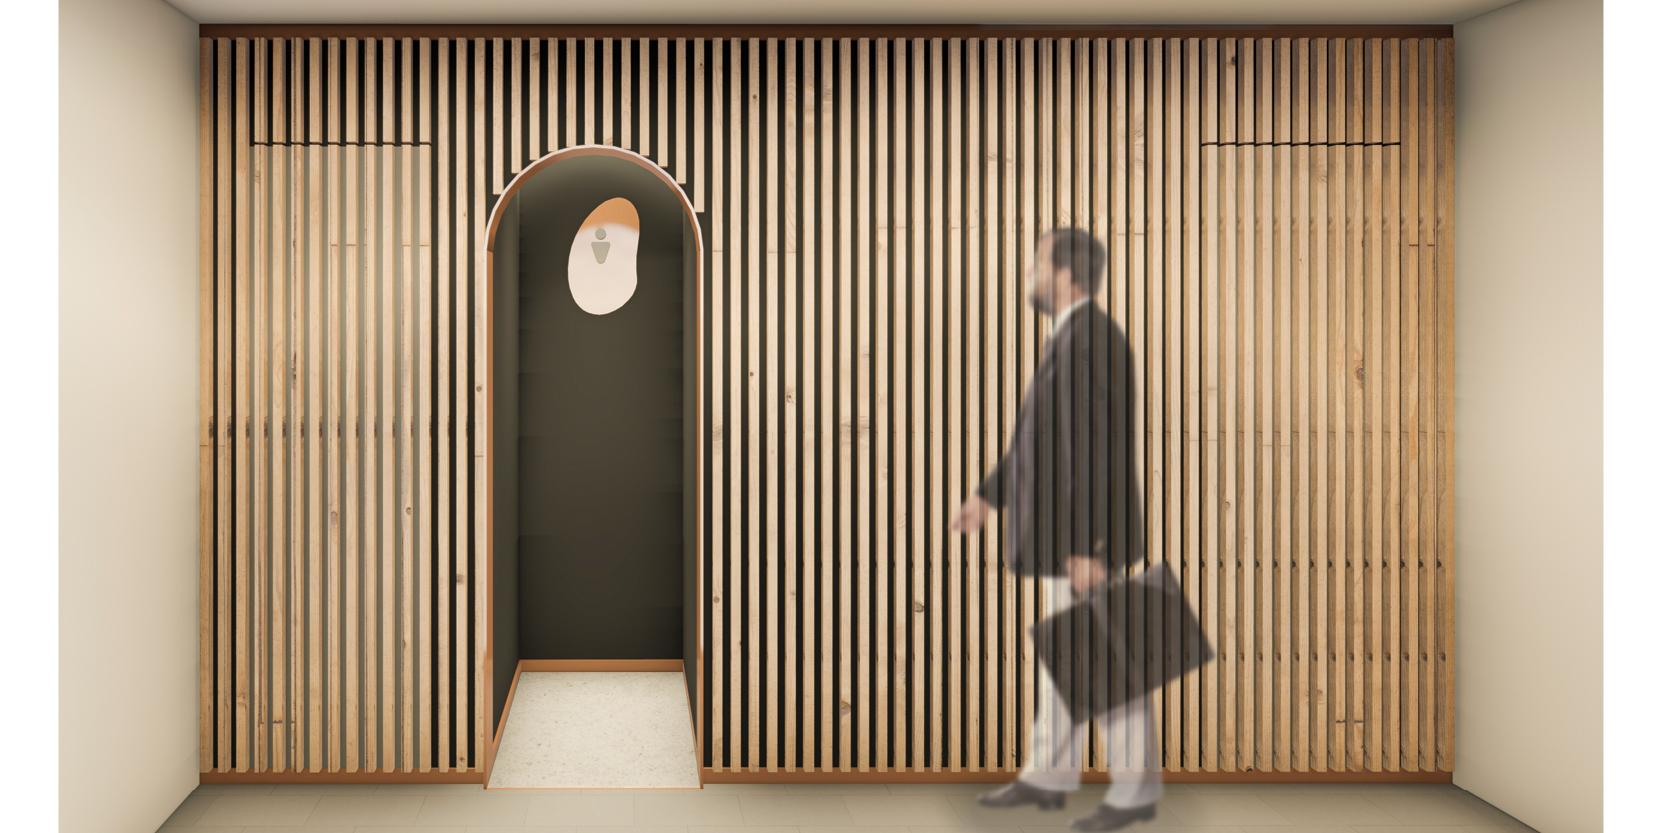 Reforma lavabos estadistica IDESCAT OCA Architects Arquitectura architecture interior design disseny interior Hernan Lleida Bernardo Garcia4